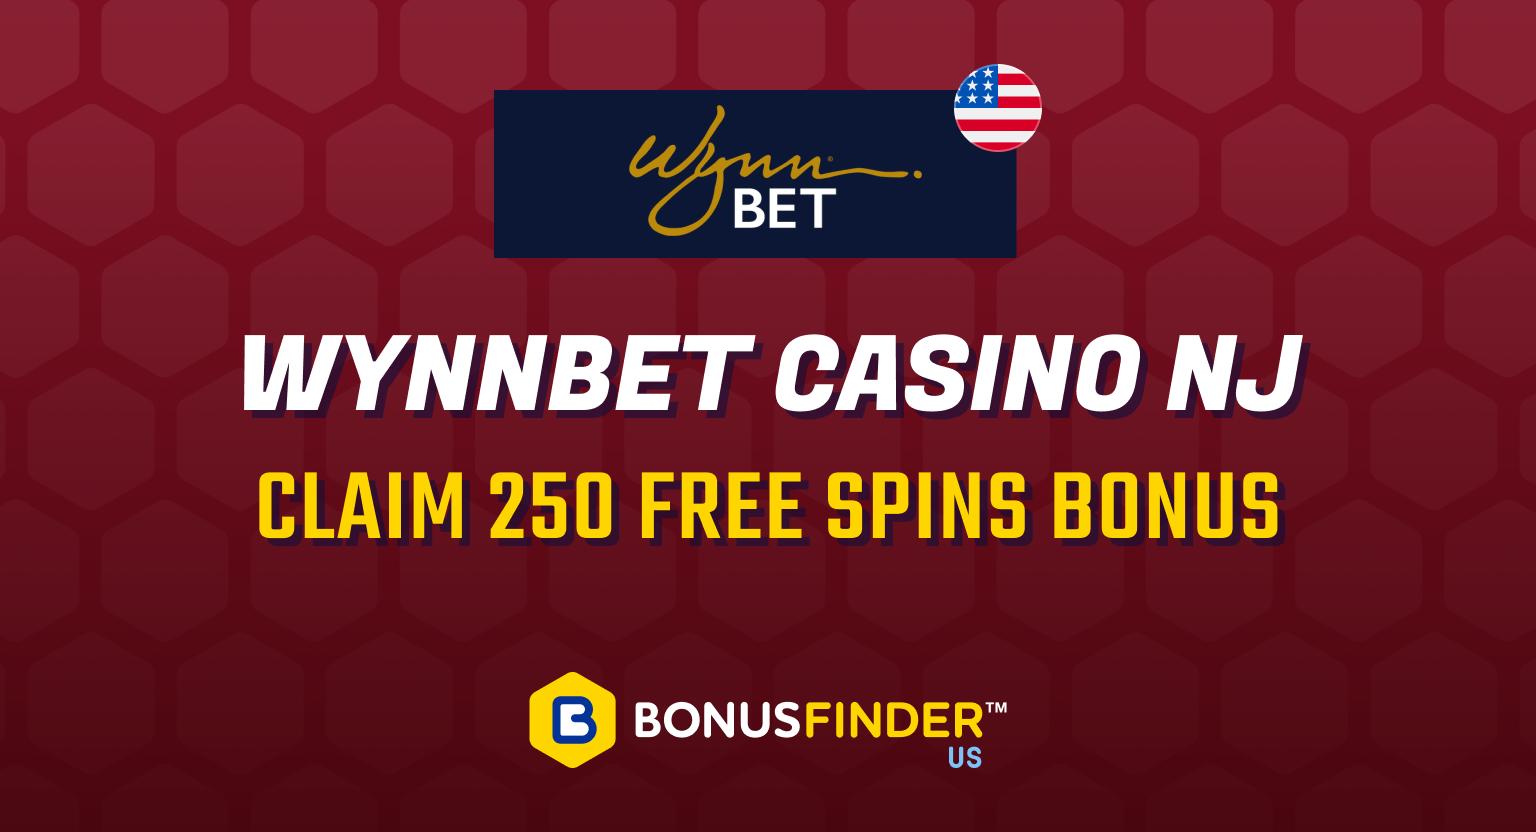 Wynn online casino nj promo code